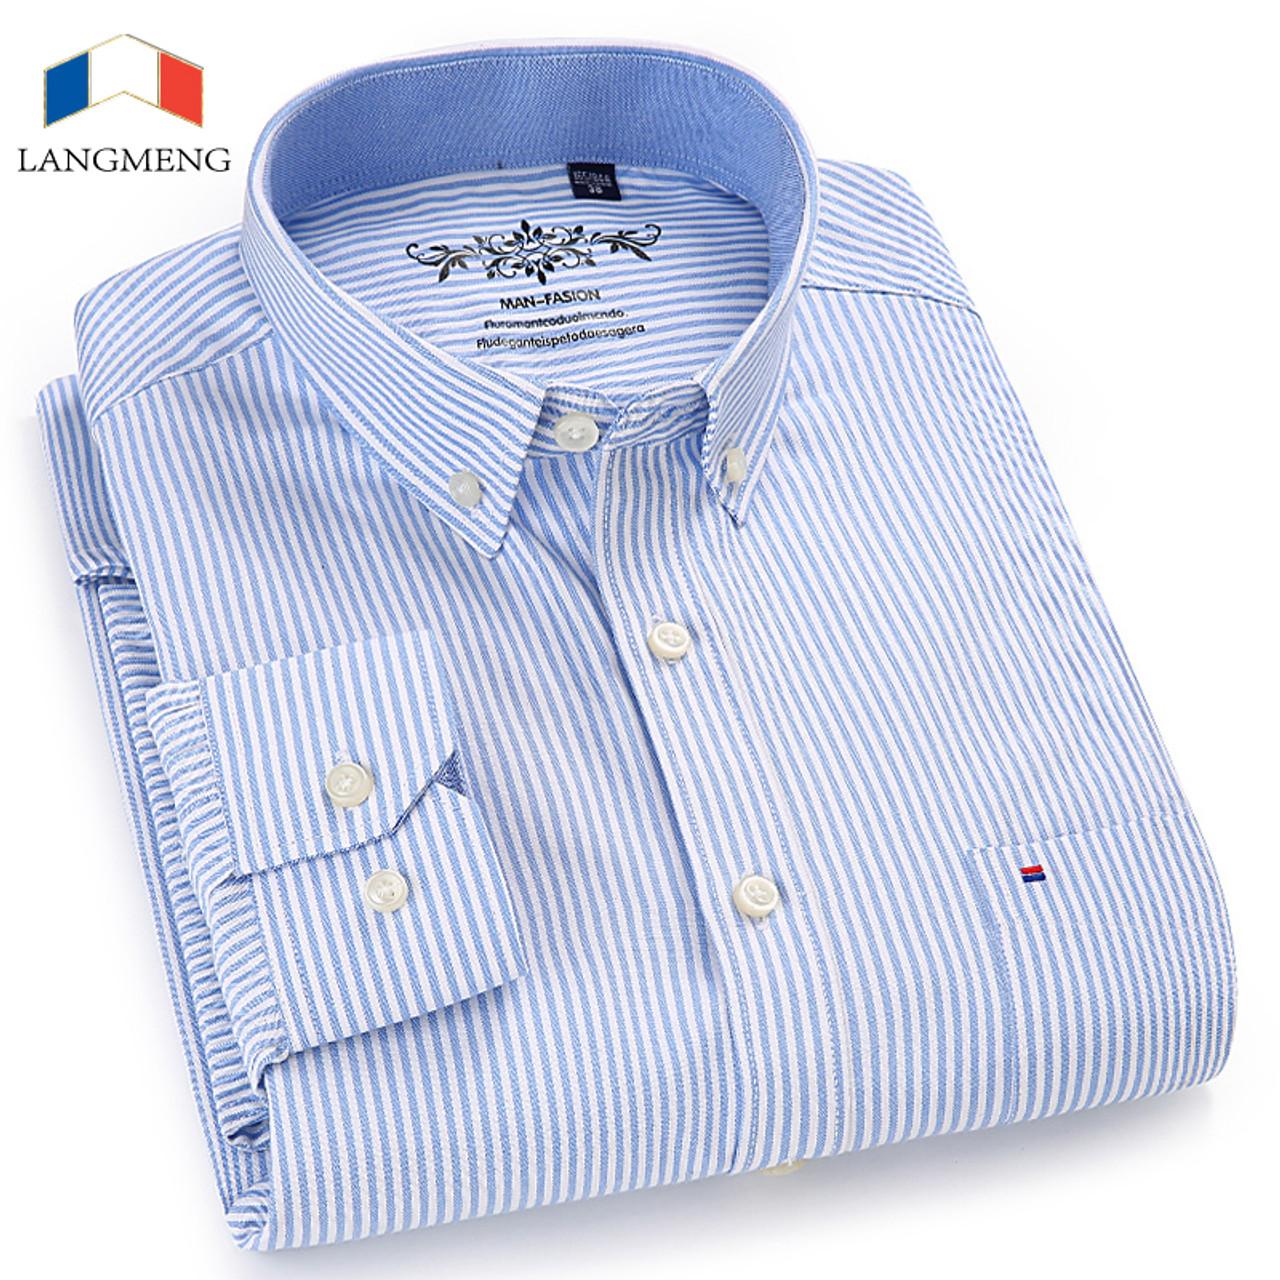 404faa7566 LANGMENG 2018 New Arrival Long Sleeve Men Shirts Cotton Formal Dress Shirt  Male Fashion Slim Fit ...